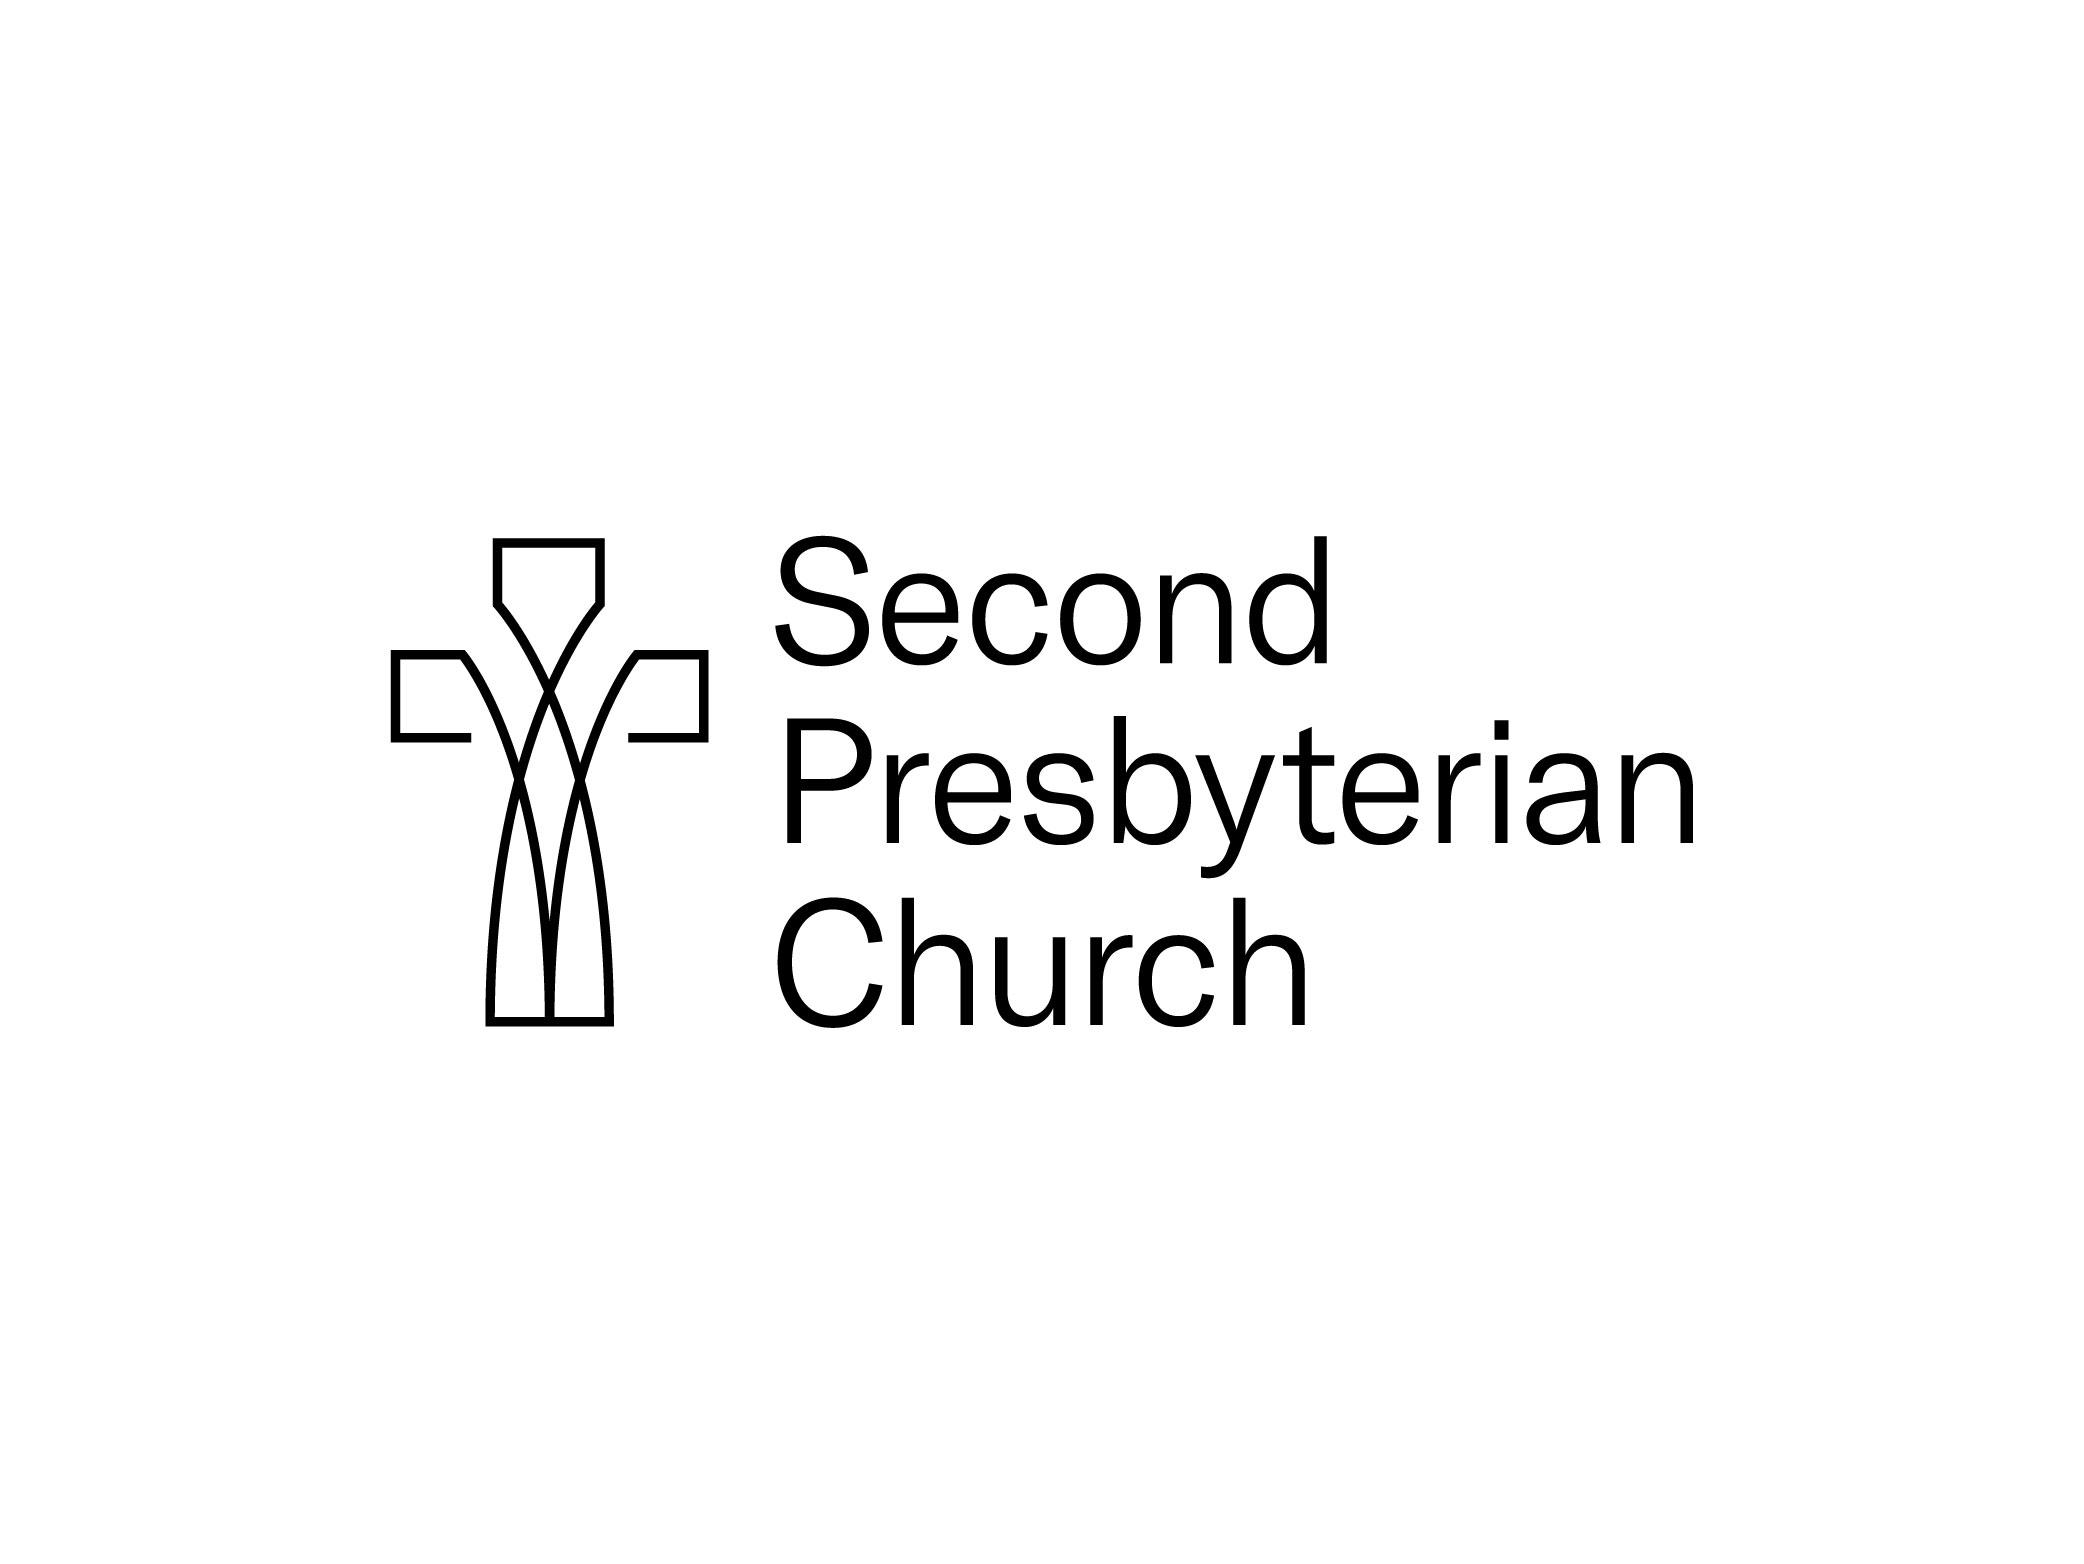 Studio Freight - Second Presbyterian Church Logo